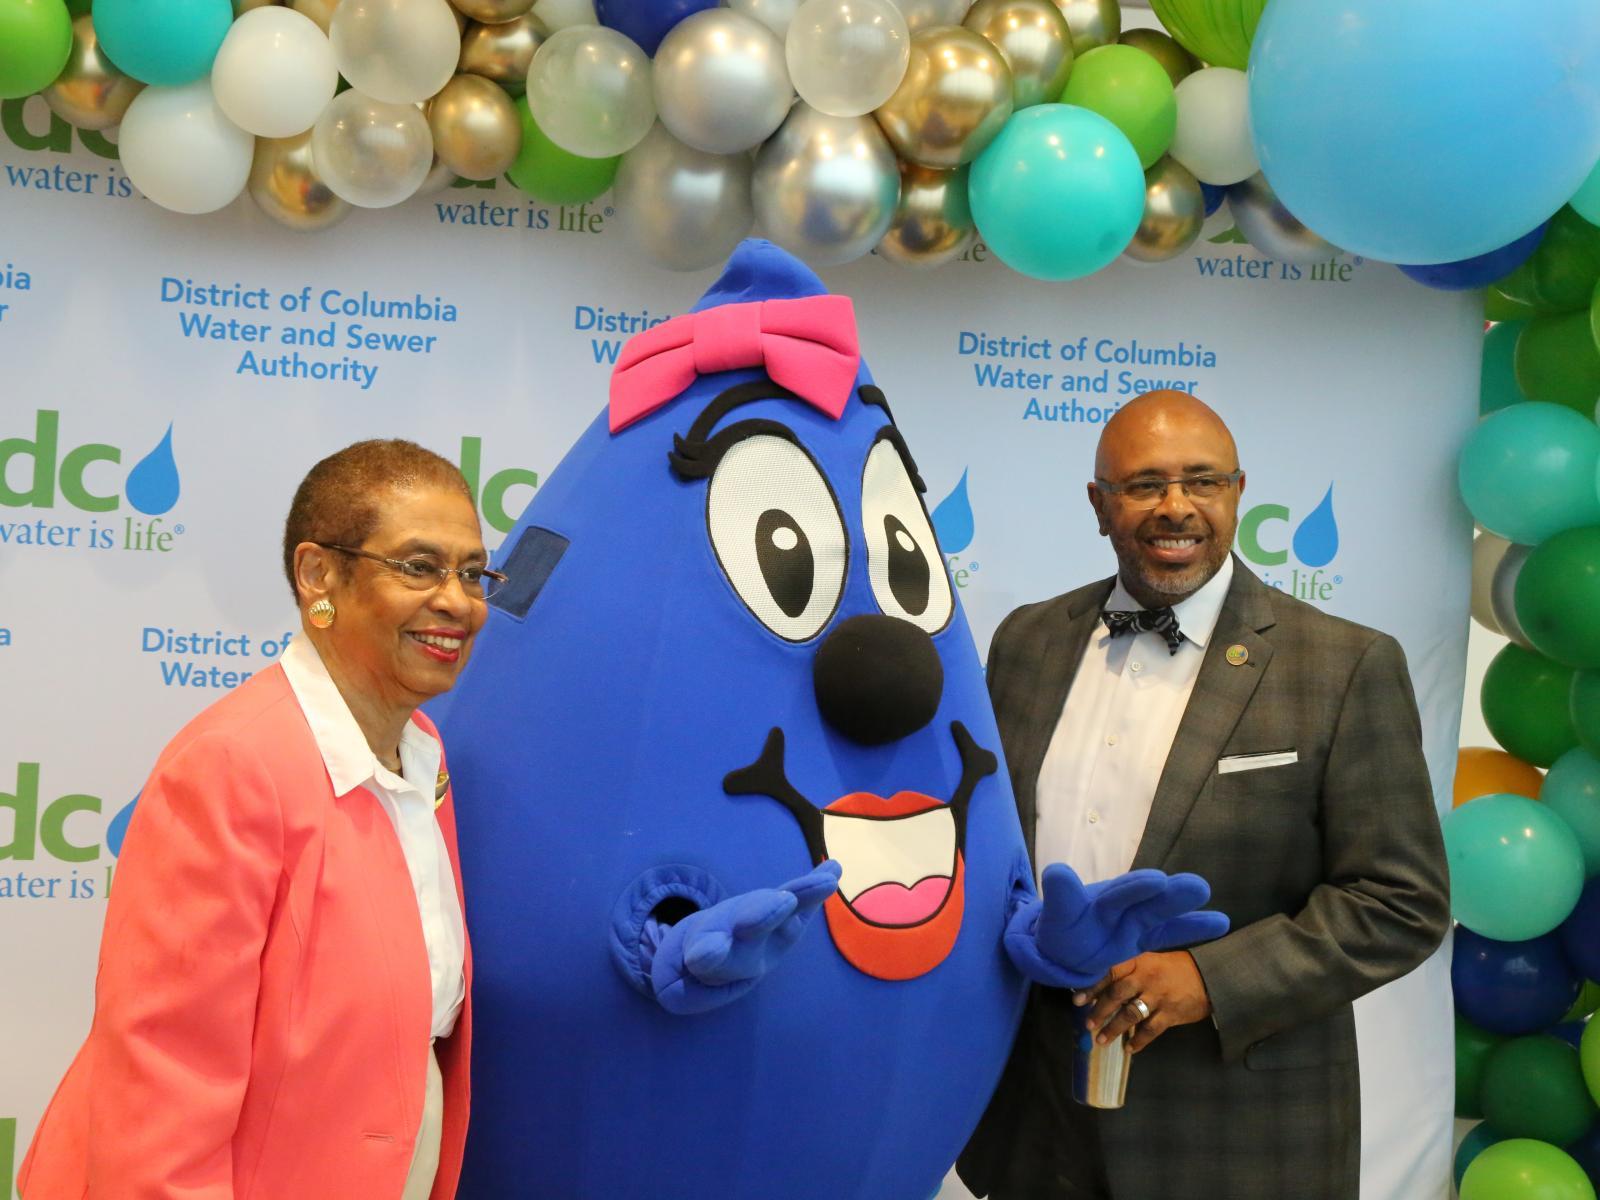 Congresswoman Eleanor Holmes Norton and DC Water CEO David Gadis celebrate new building